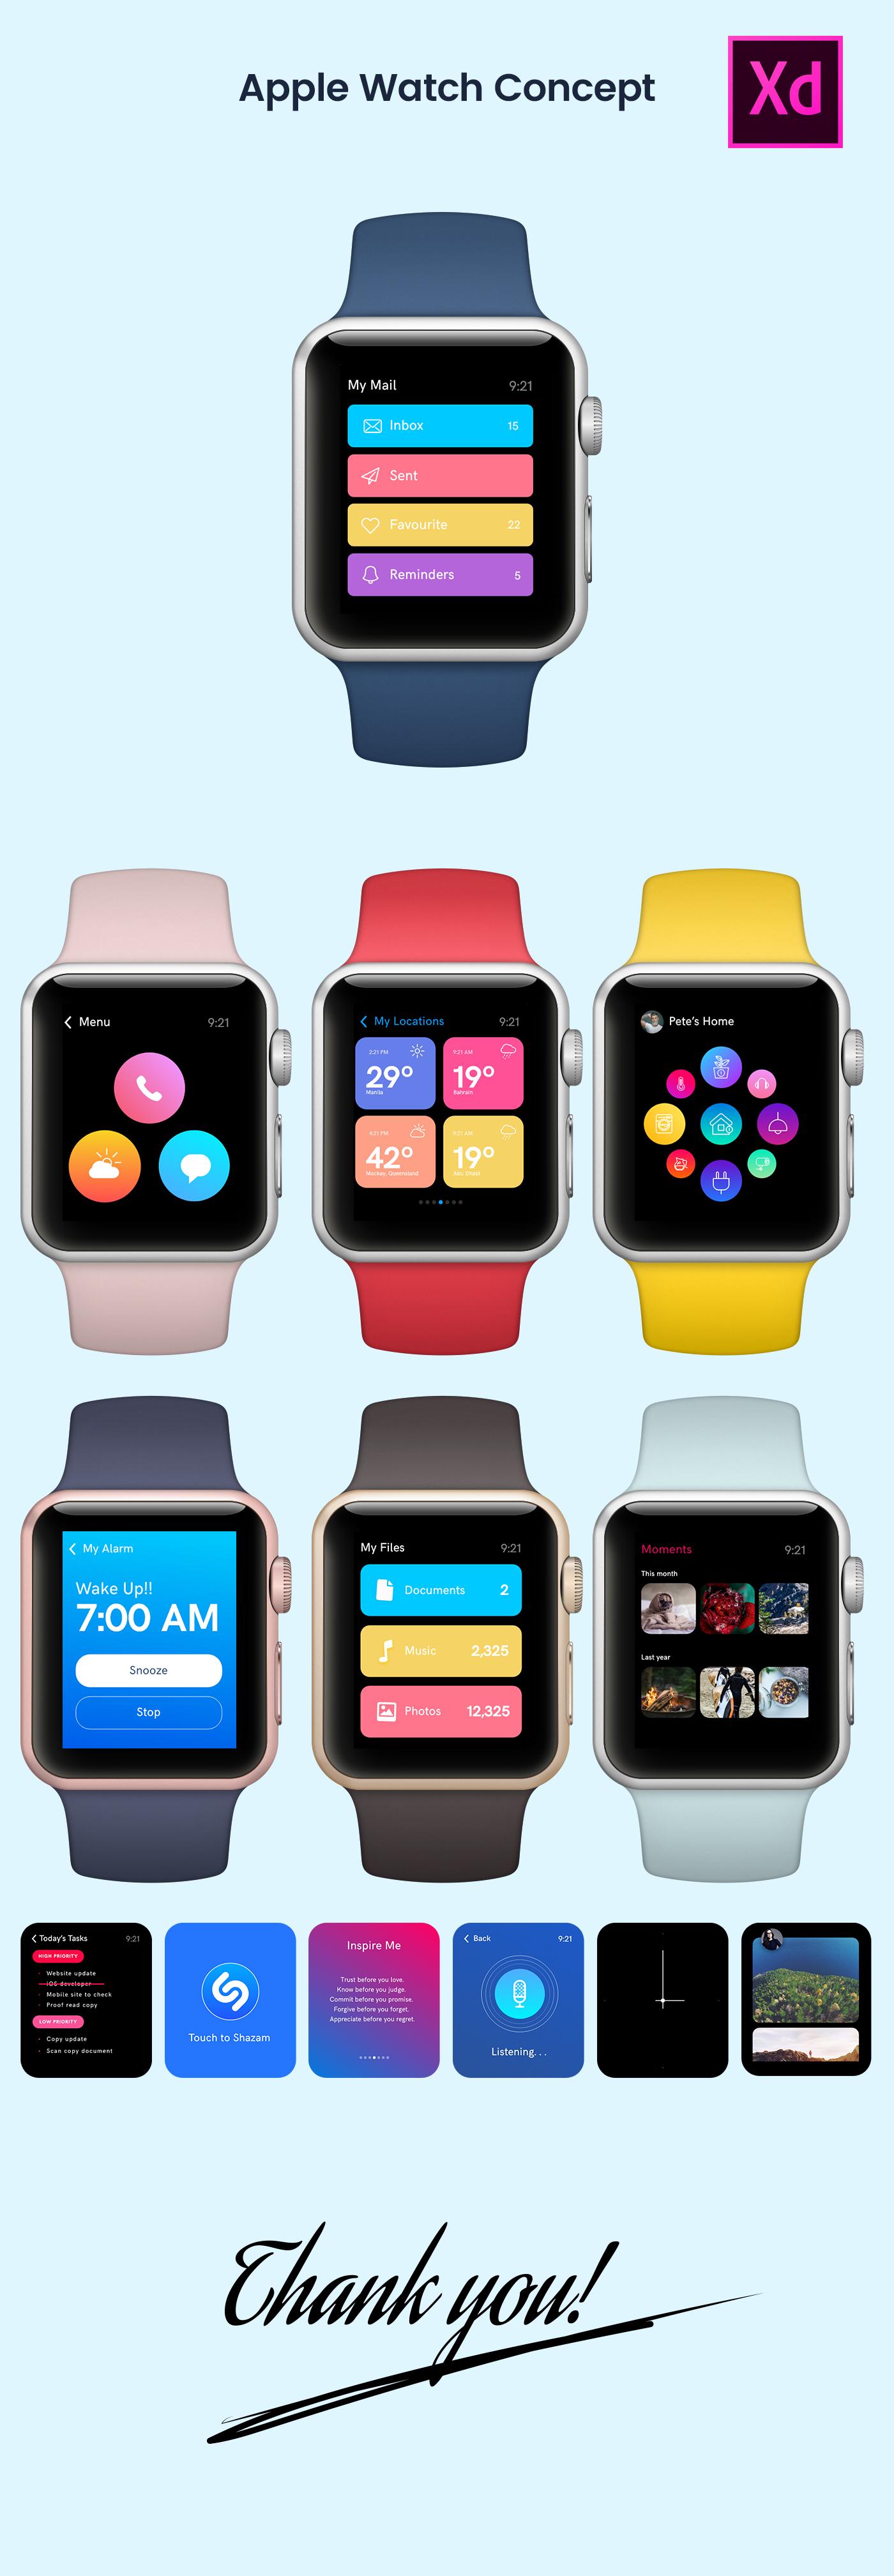 freebie adobexd apple watch Wearable UI ux design concepts MadeWithAdobeXd